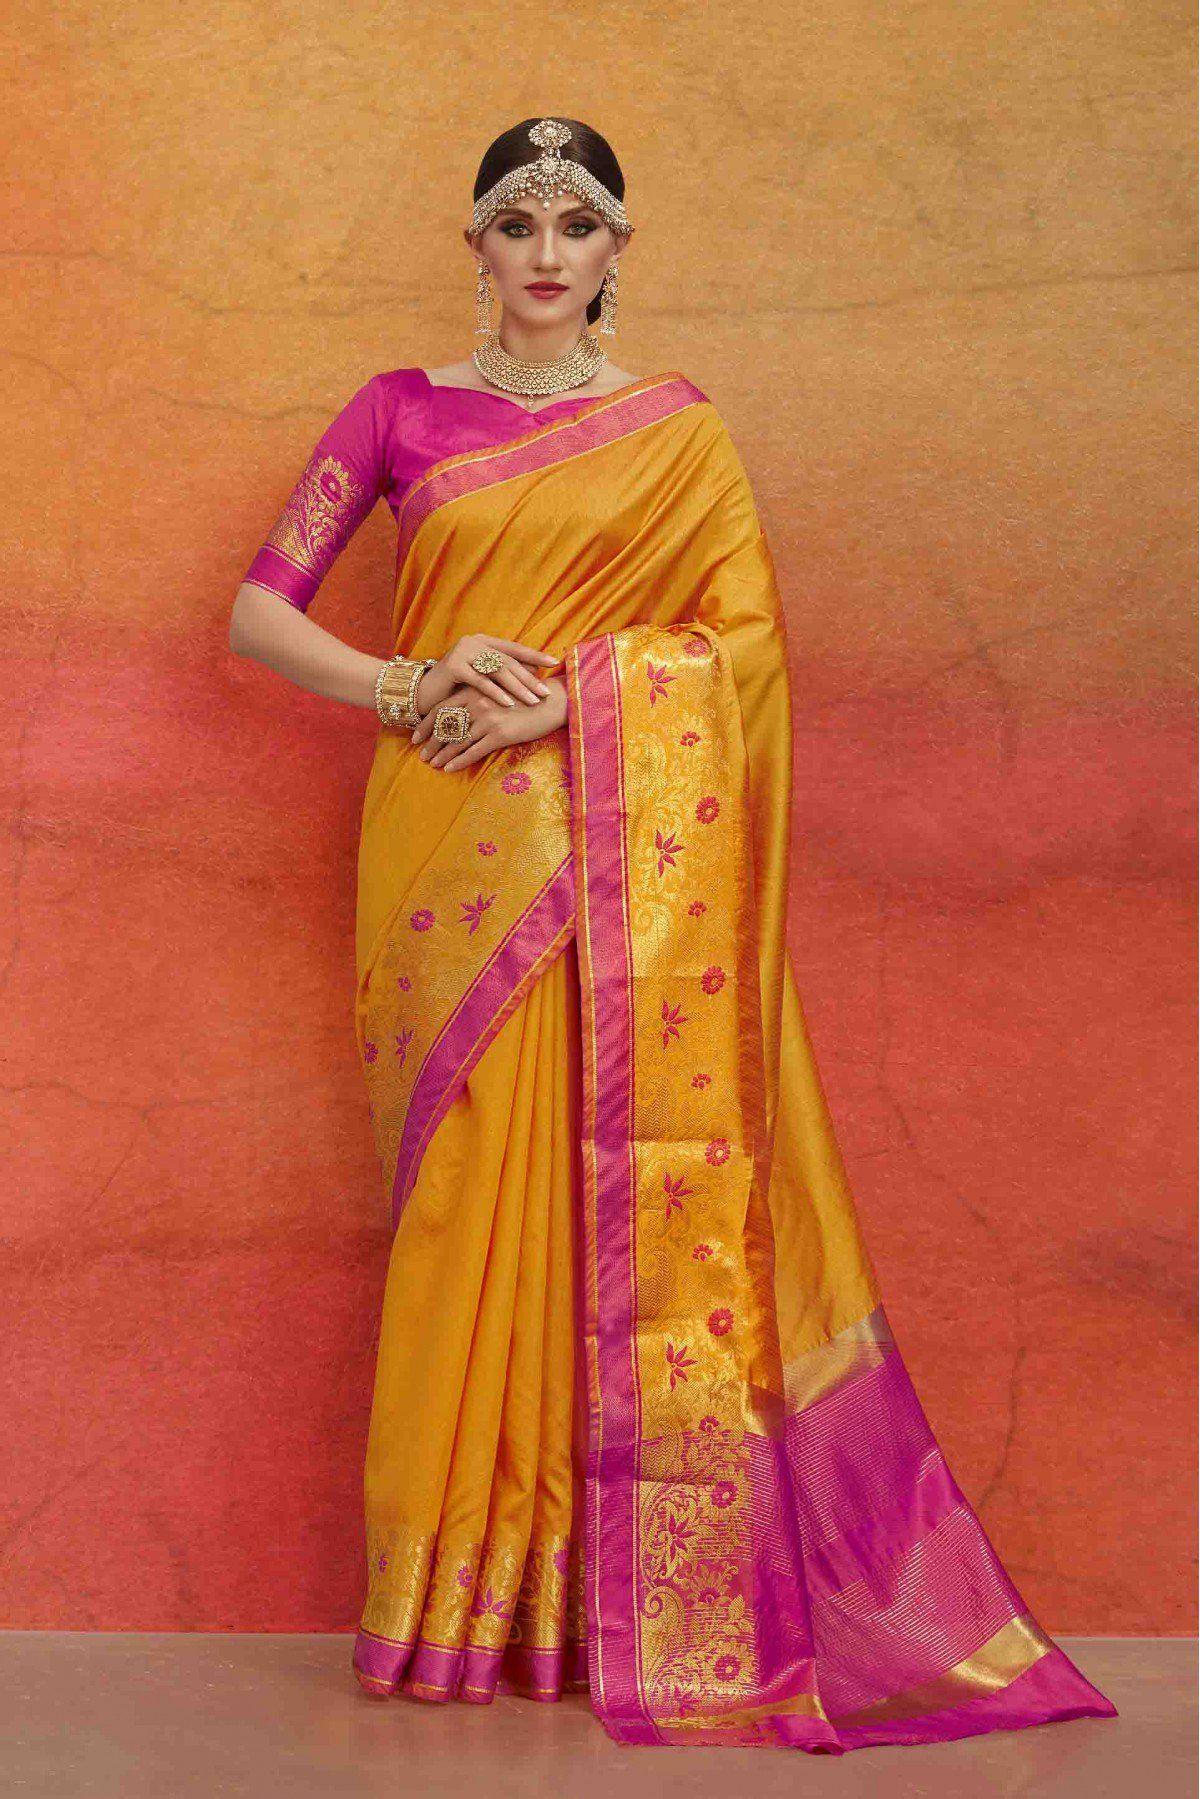 80cc015c52 Buy Bhagalpuri Silk Saree In Mustard Colour @ ninecolours.com. Worldwide  Free Shipping Available